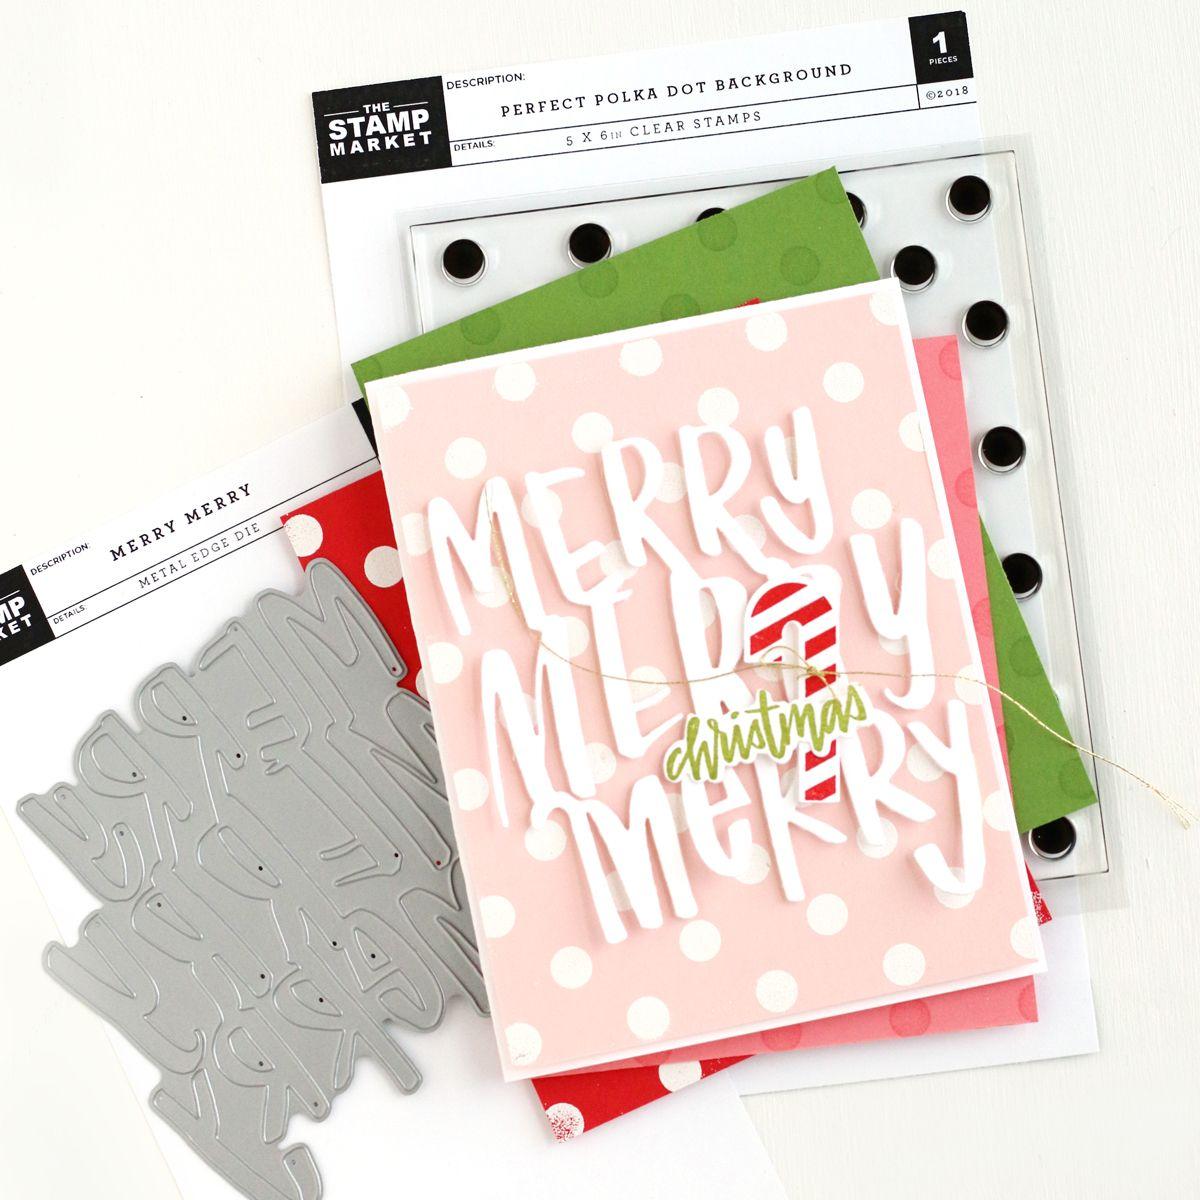 4 x Small Hand Emotions Metal Cutting Die,Stencil,Card Making,Scrap booking,DIY